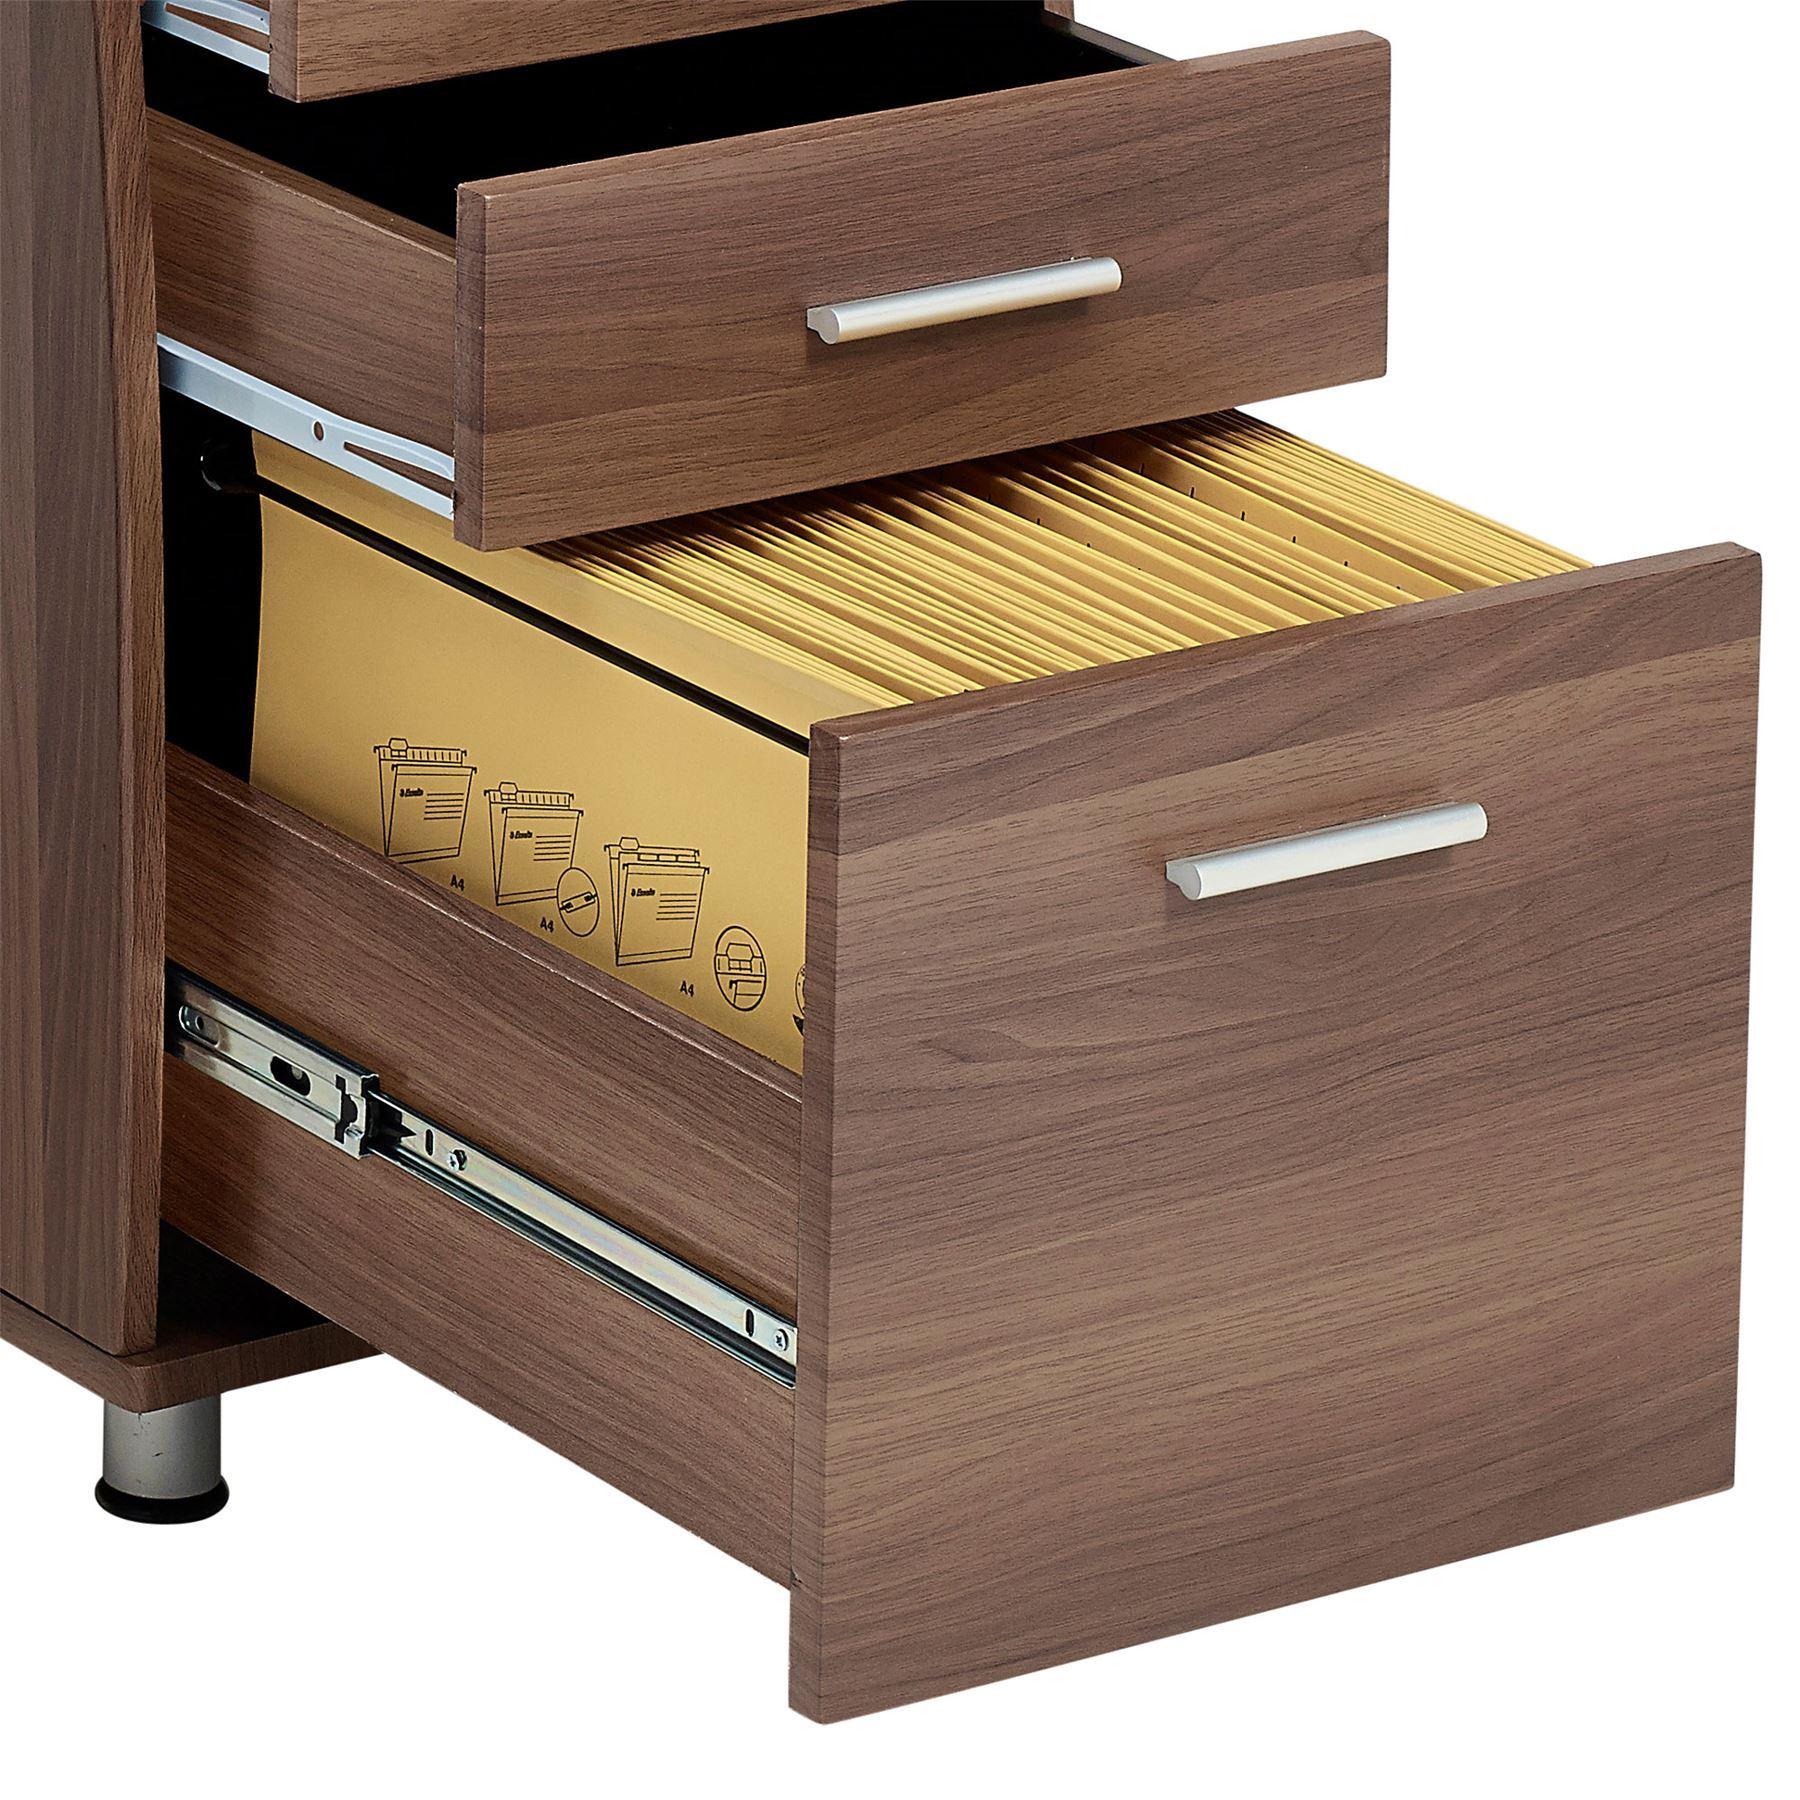 Large Corner Computer Desk A4 Filing Drawer for Home Office Piranha Regal PC 28w